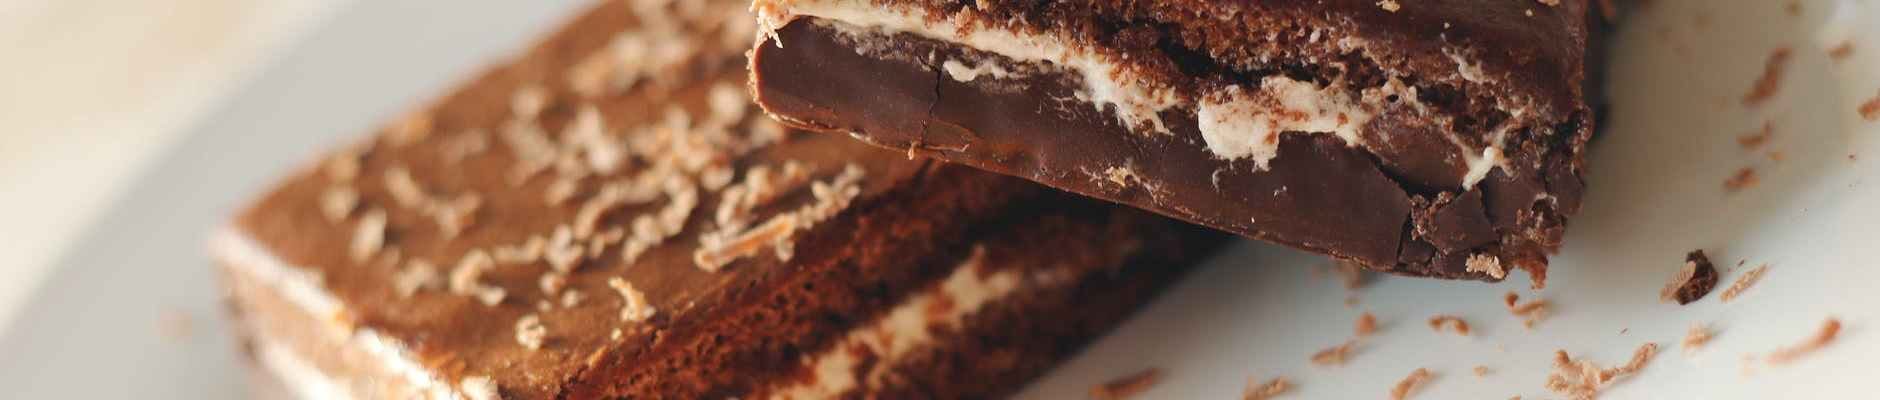 brownies cake chocolate dessert